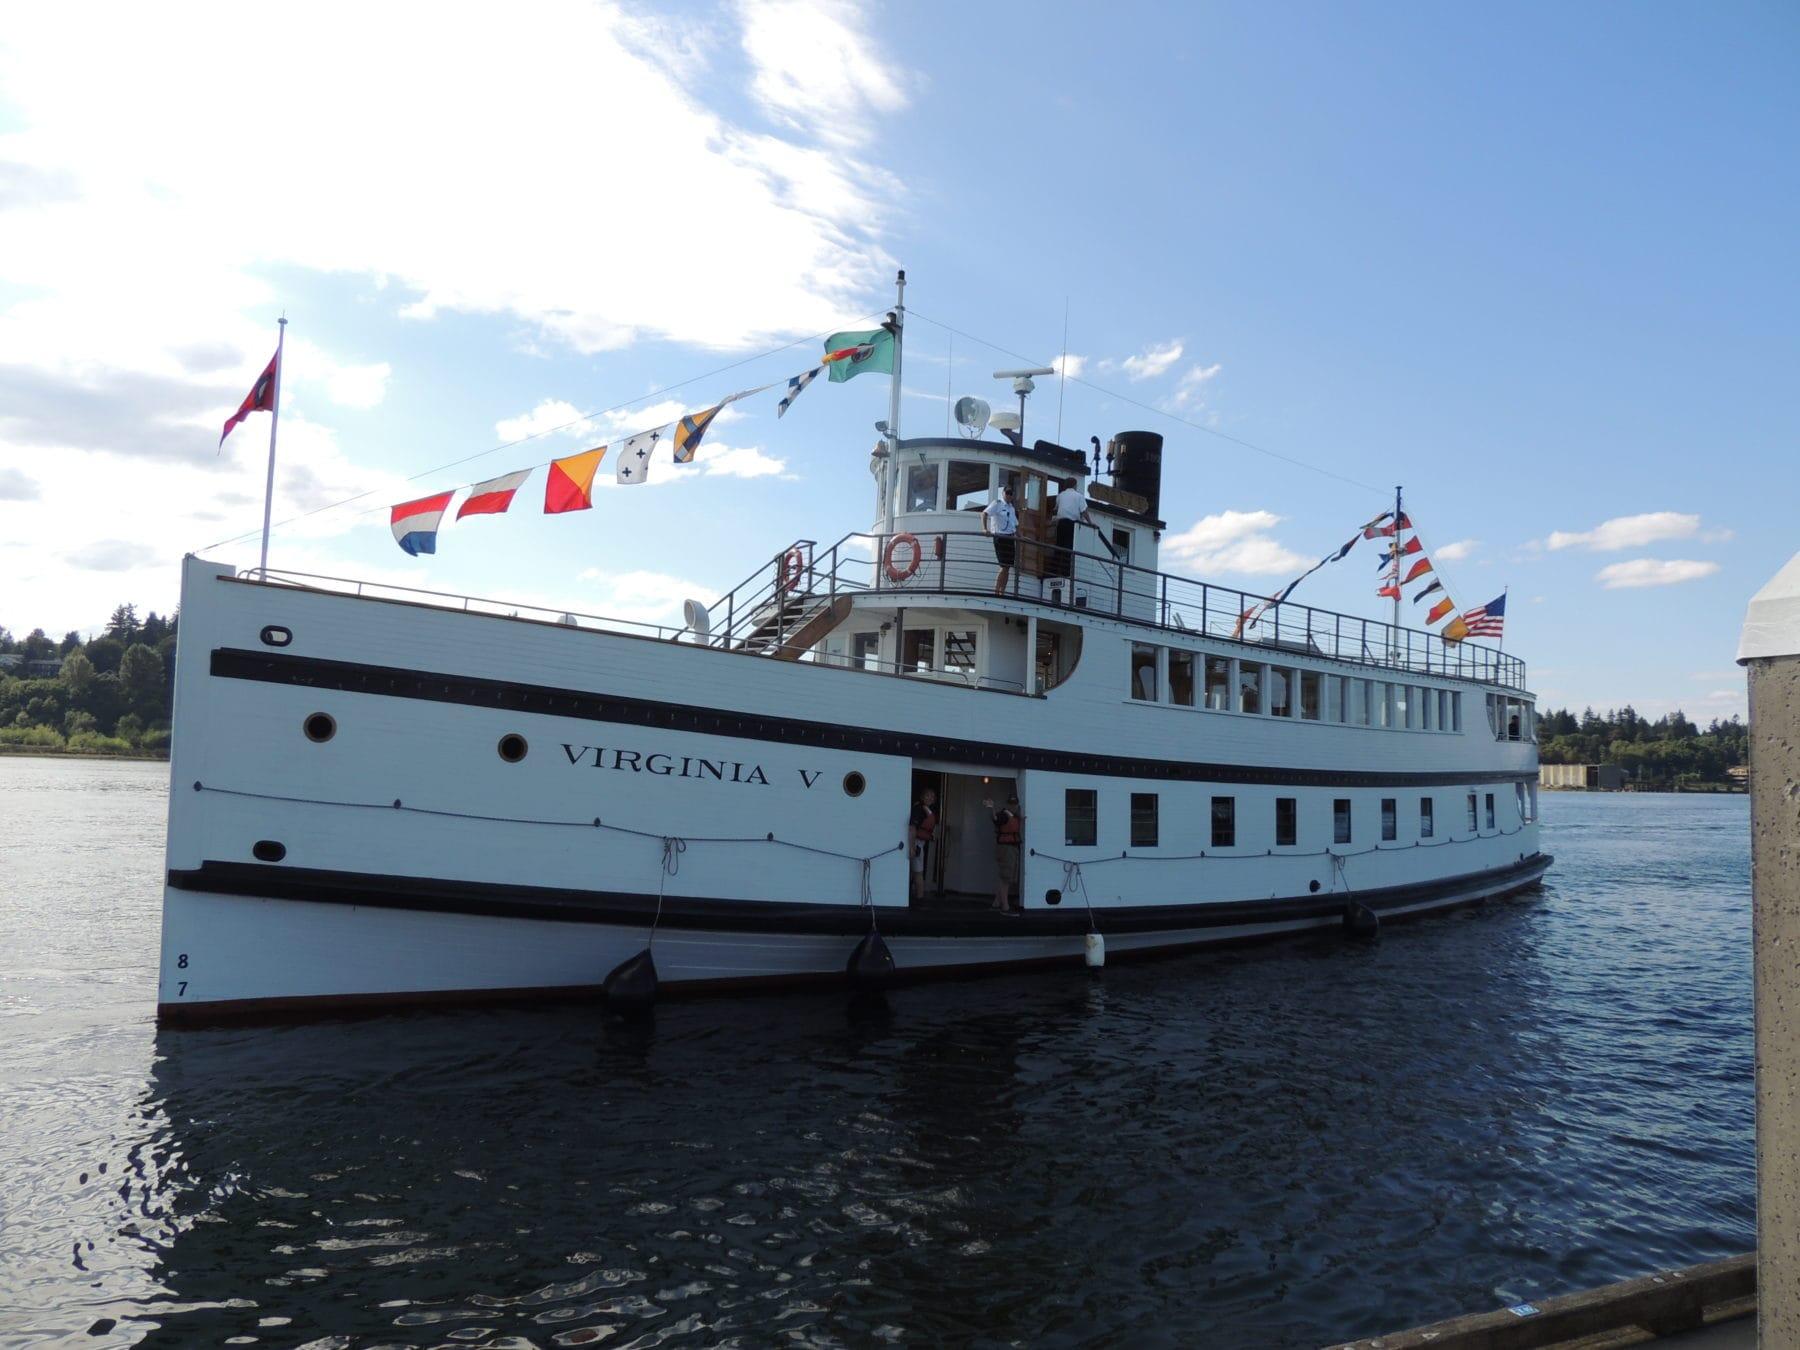 virginia v steamer charters seattle